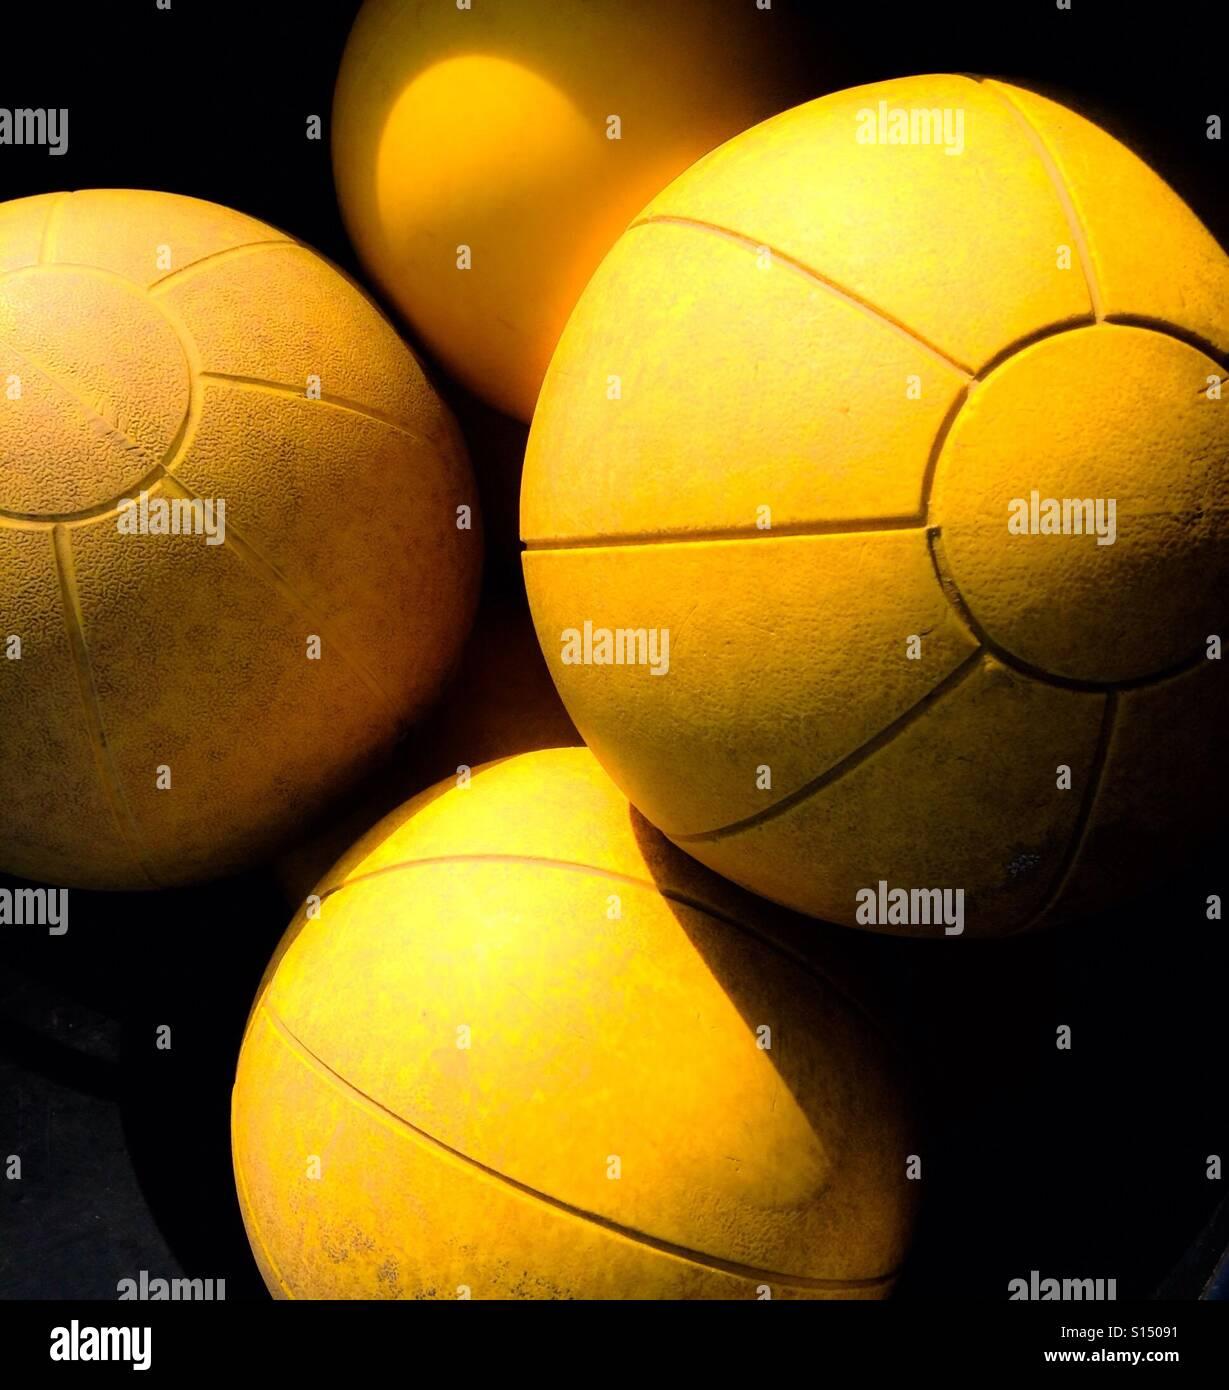 Yellow medicine balls - Stock Image